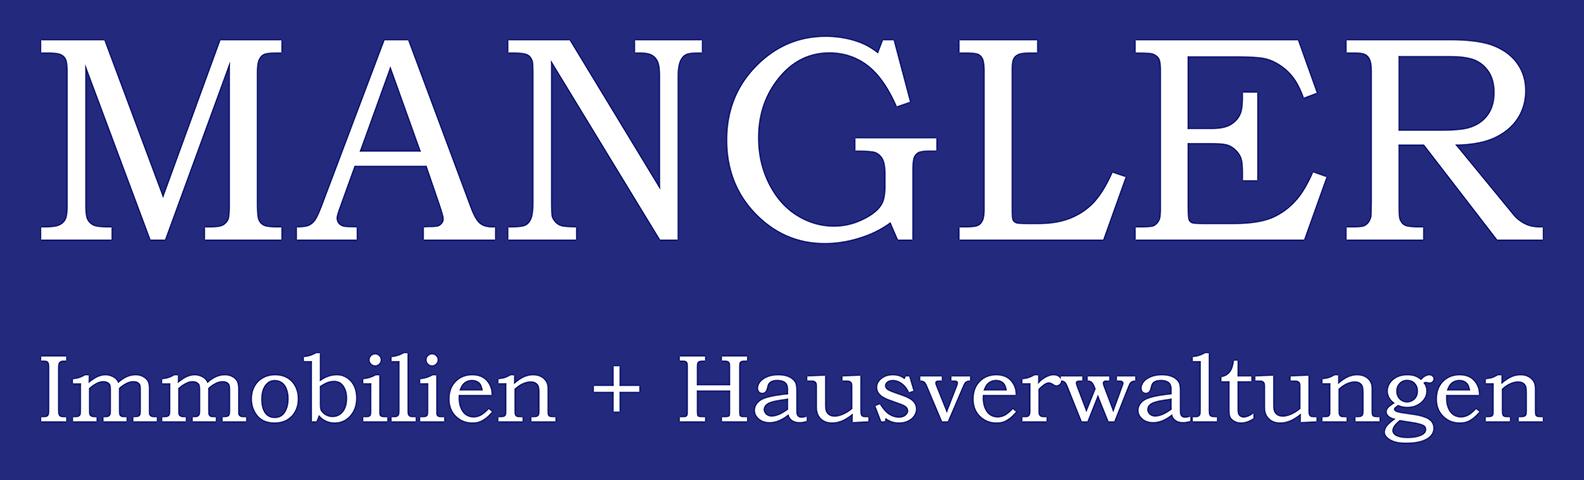 Mangler Immobilien & Hausverwaltungen